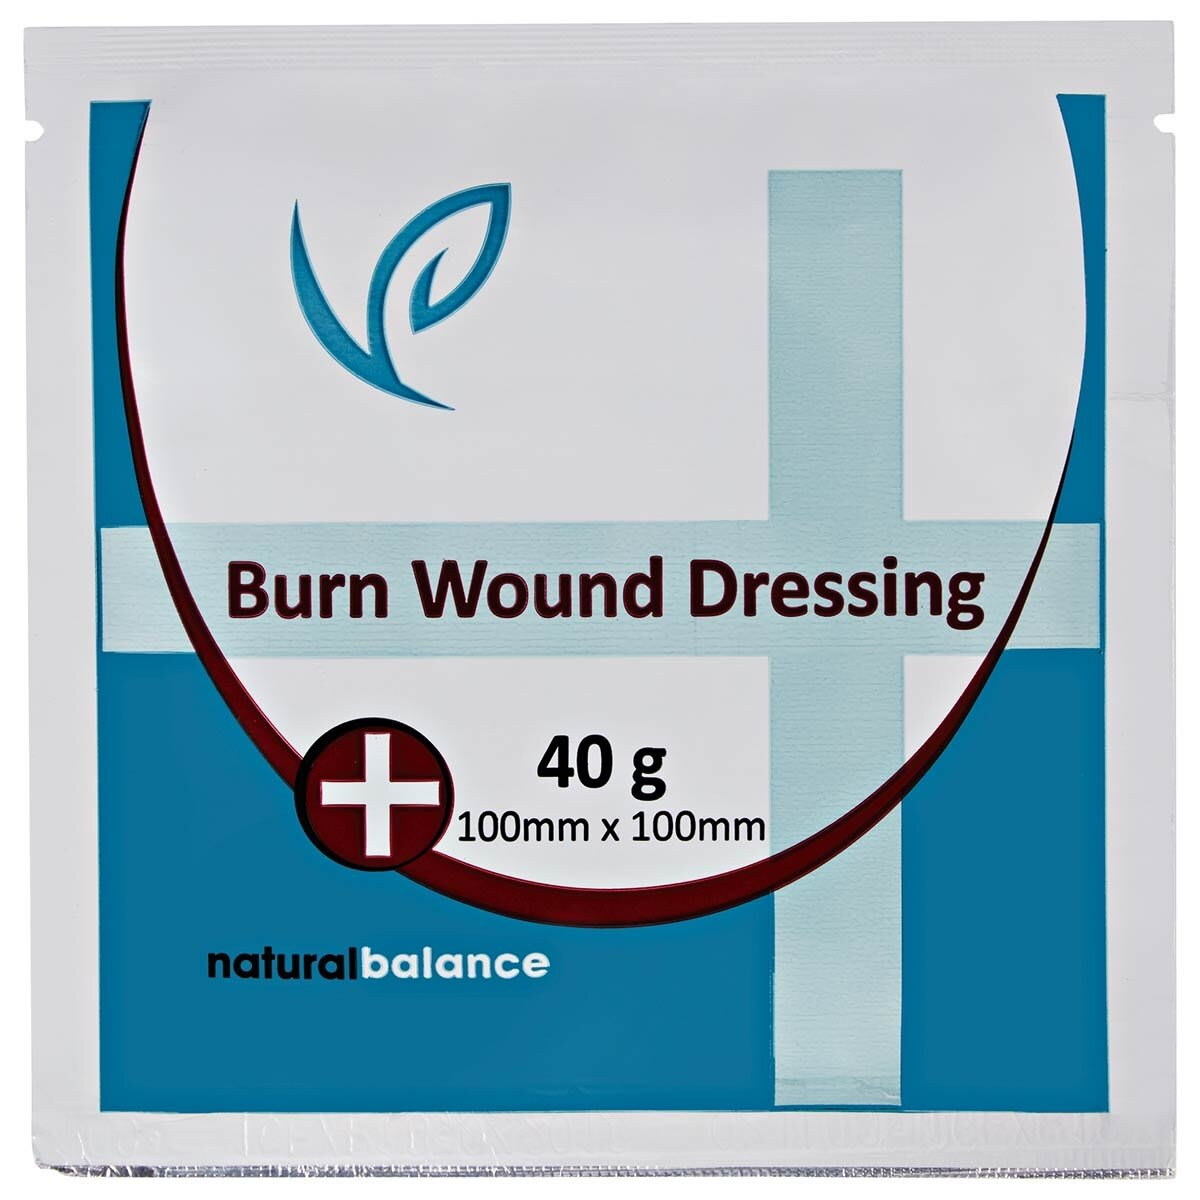 Natural Balance Burn Wound Dressing